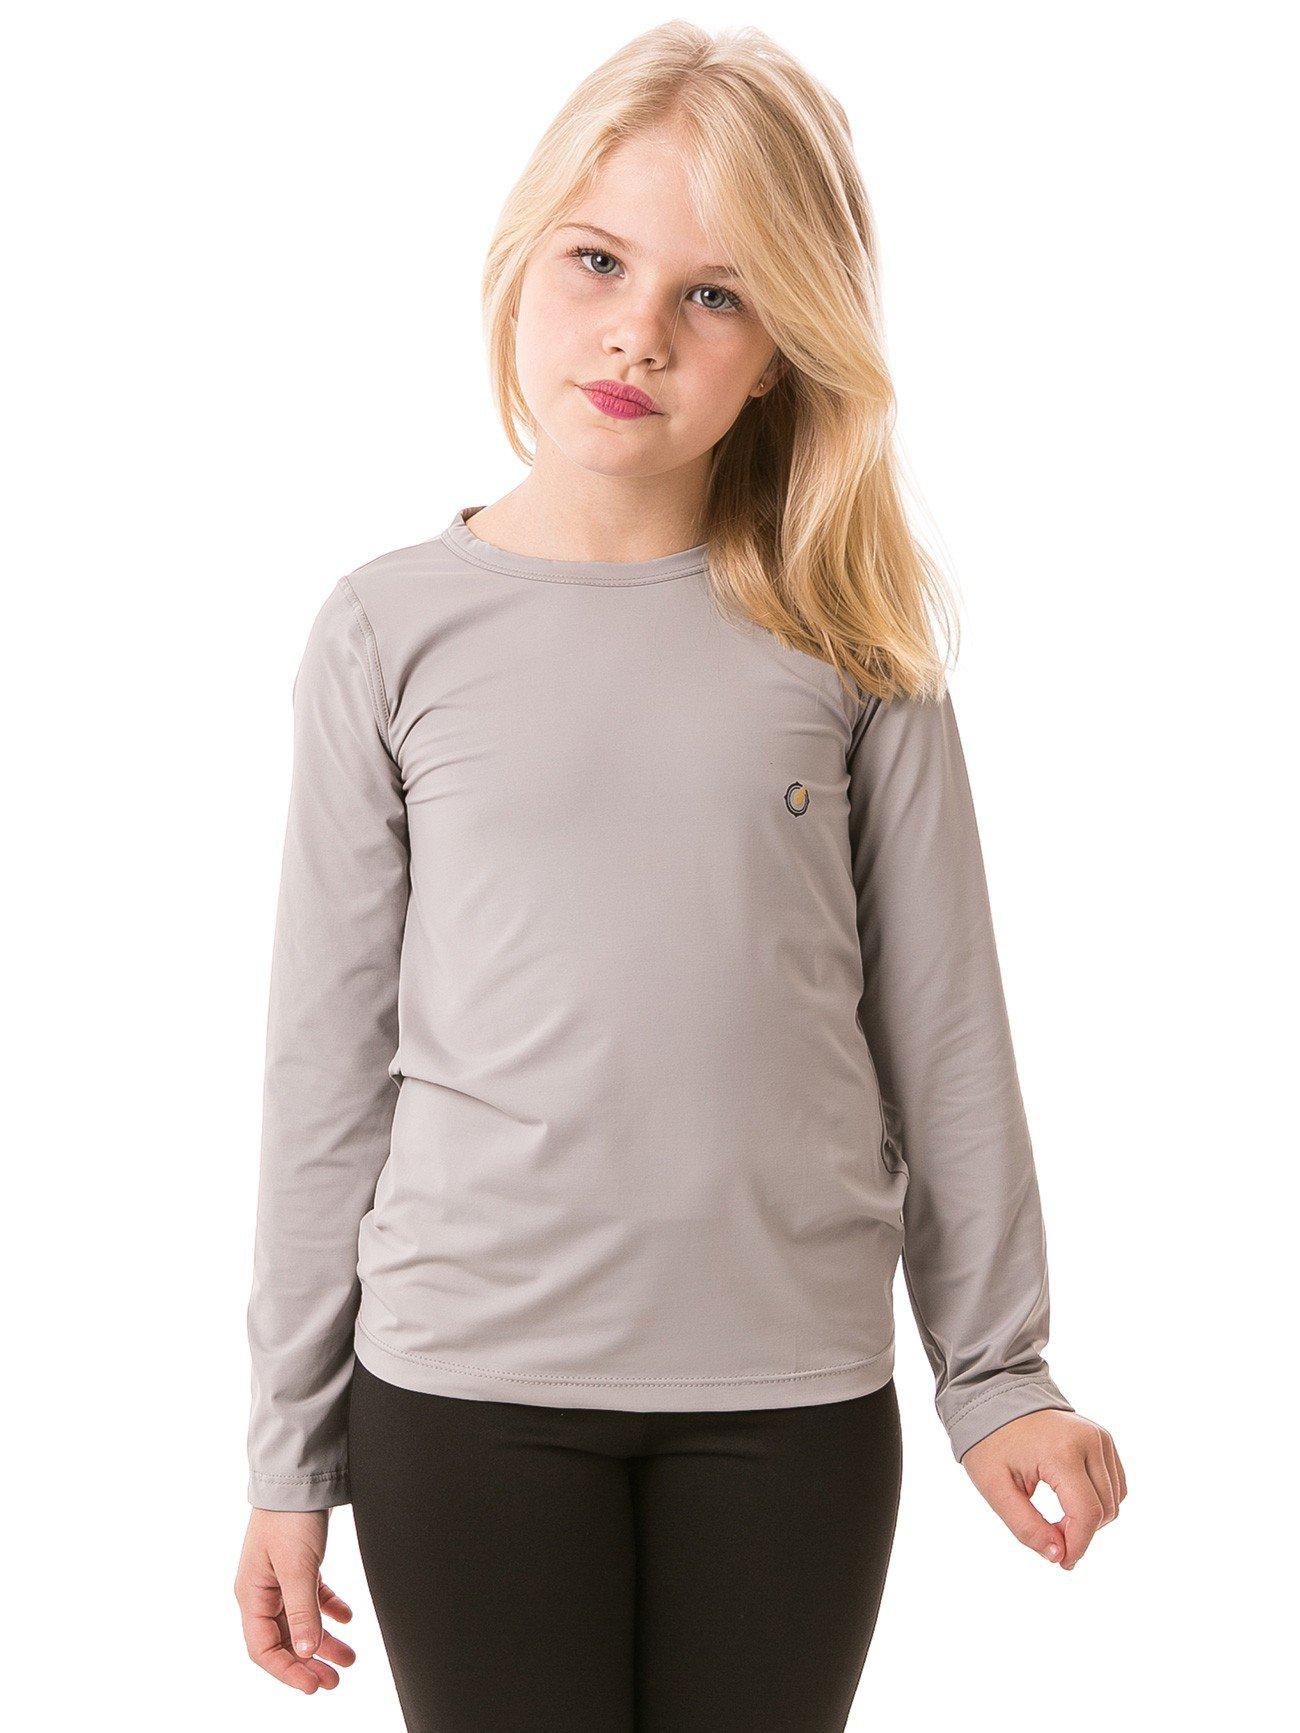 feminina infantil t shirt longa ice cinza frente b